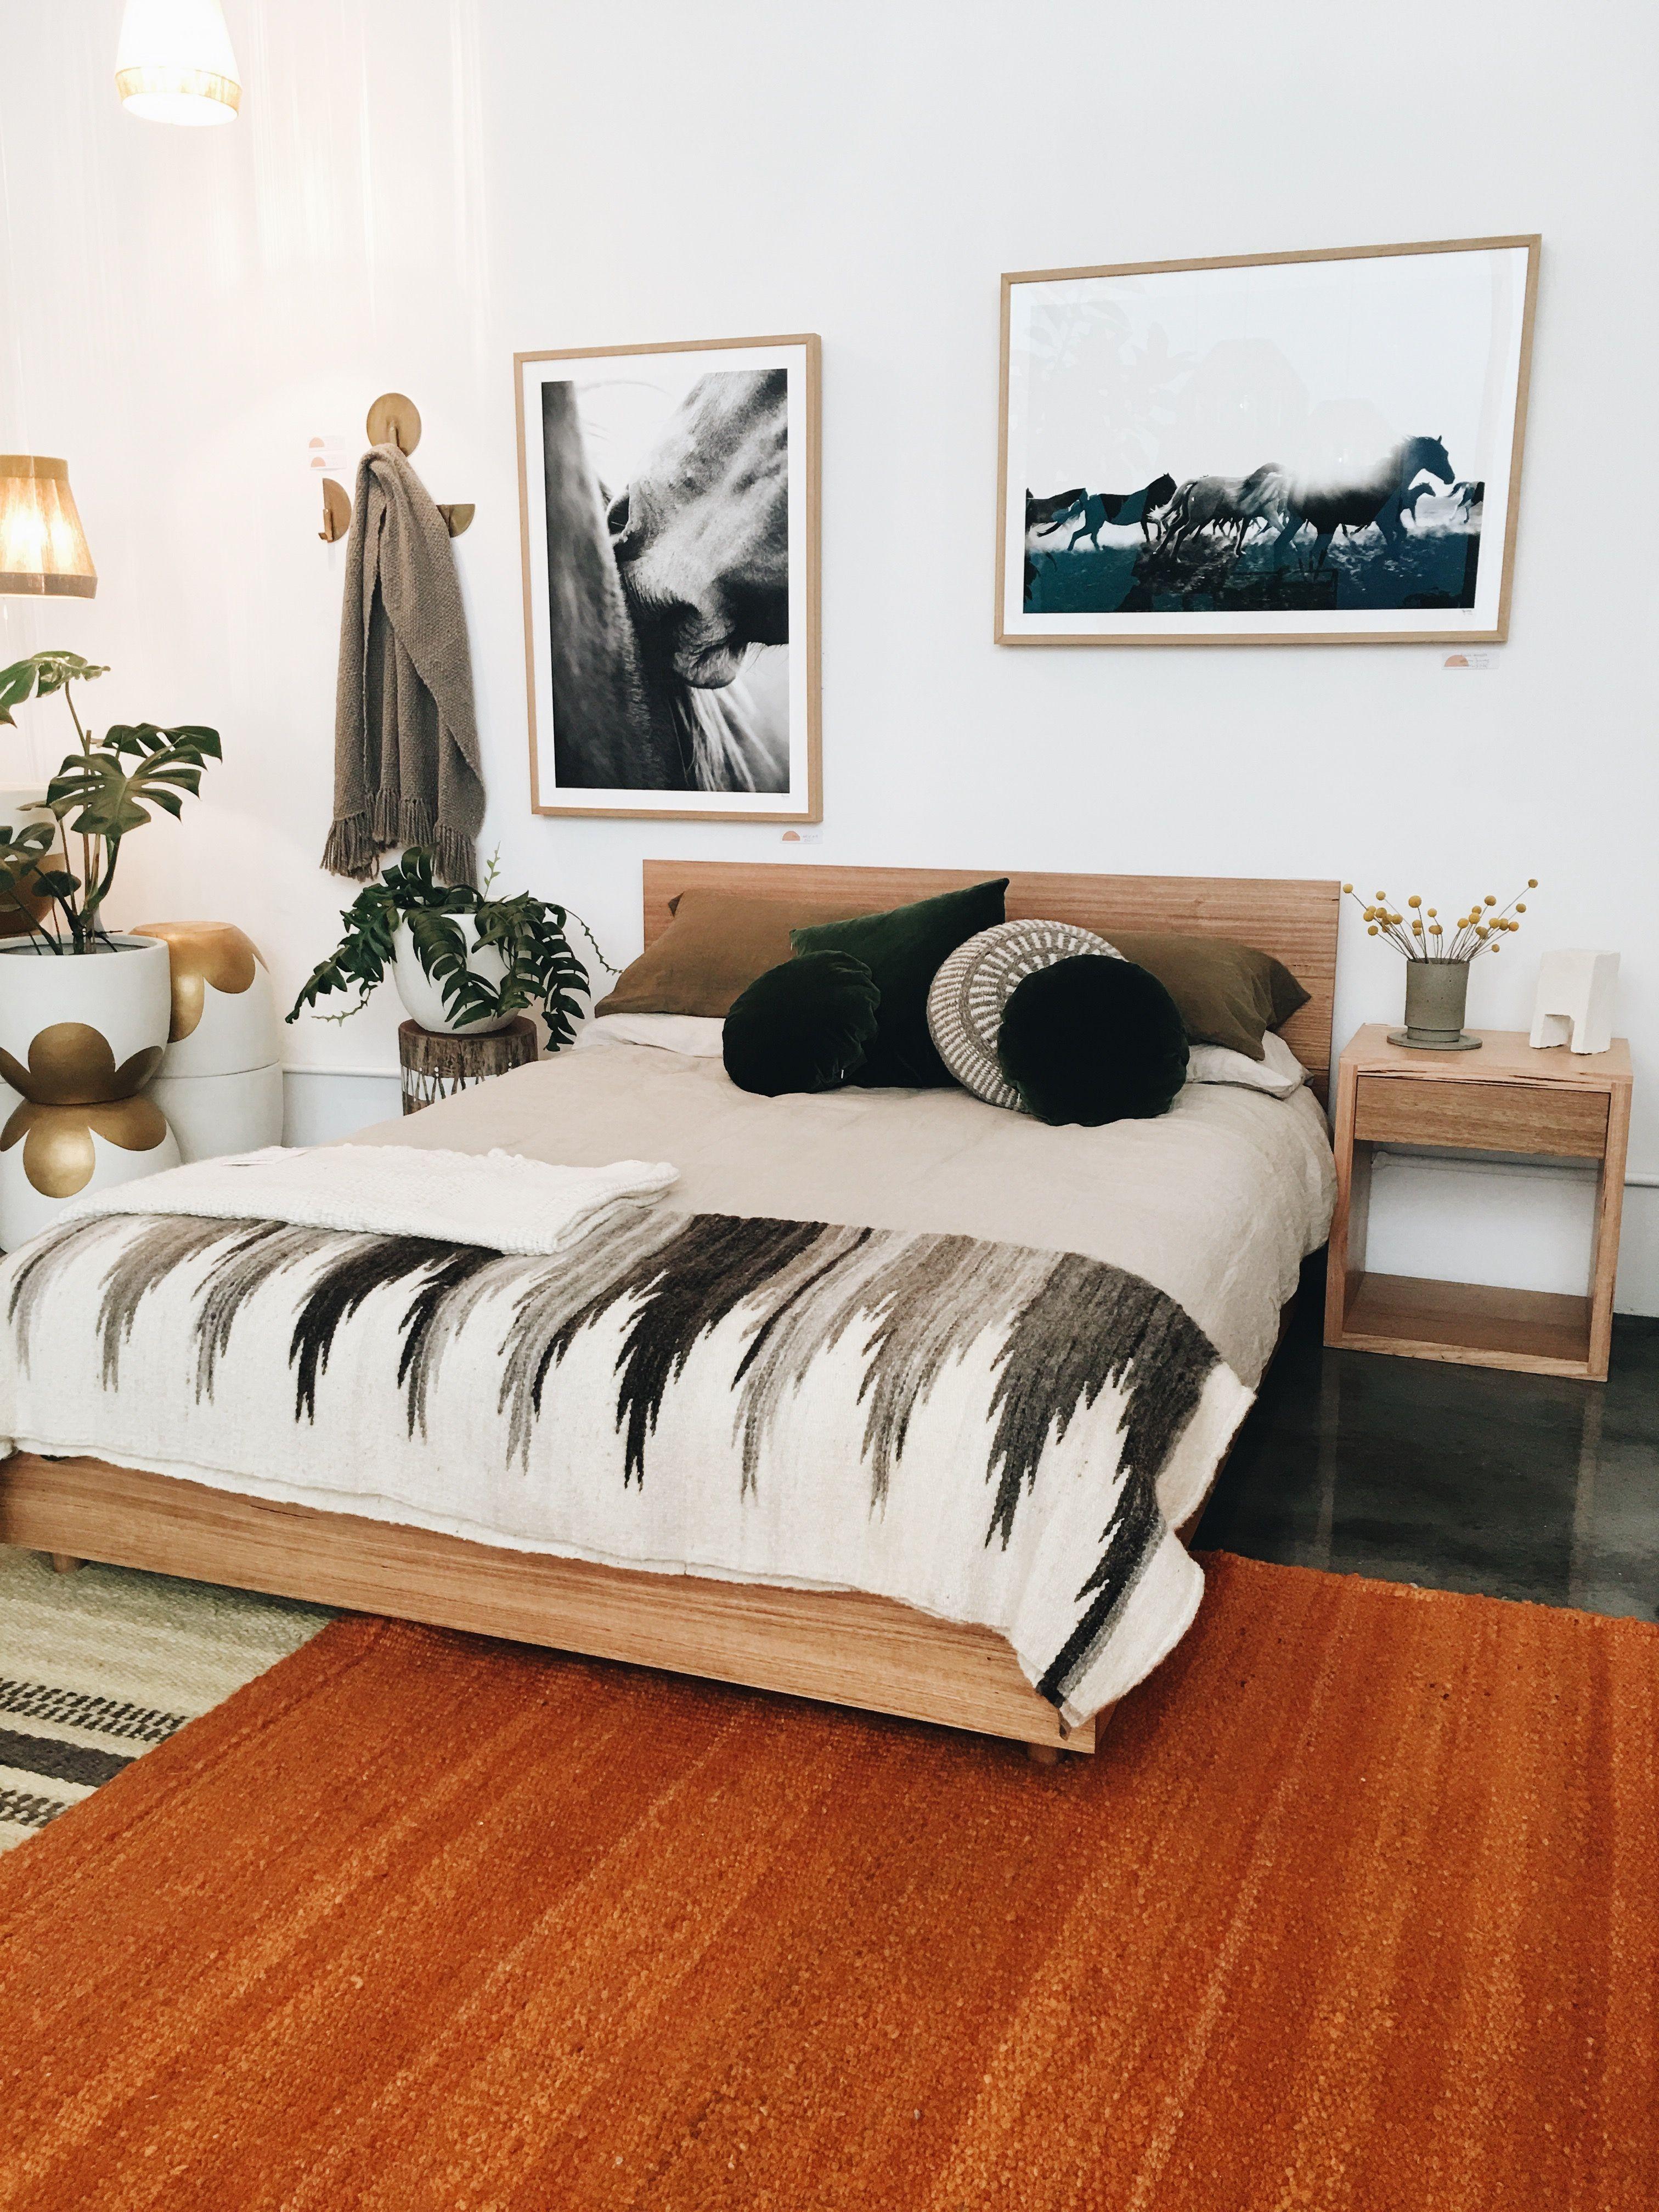 5 hardwood flooring of cheap wood flooring cool lovely white oak hardwood flooring easoon with regard to cheap wood flooring bedroom wood floors excellent bedroom design with buy hardwood 0d